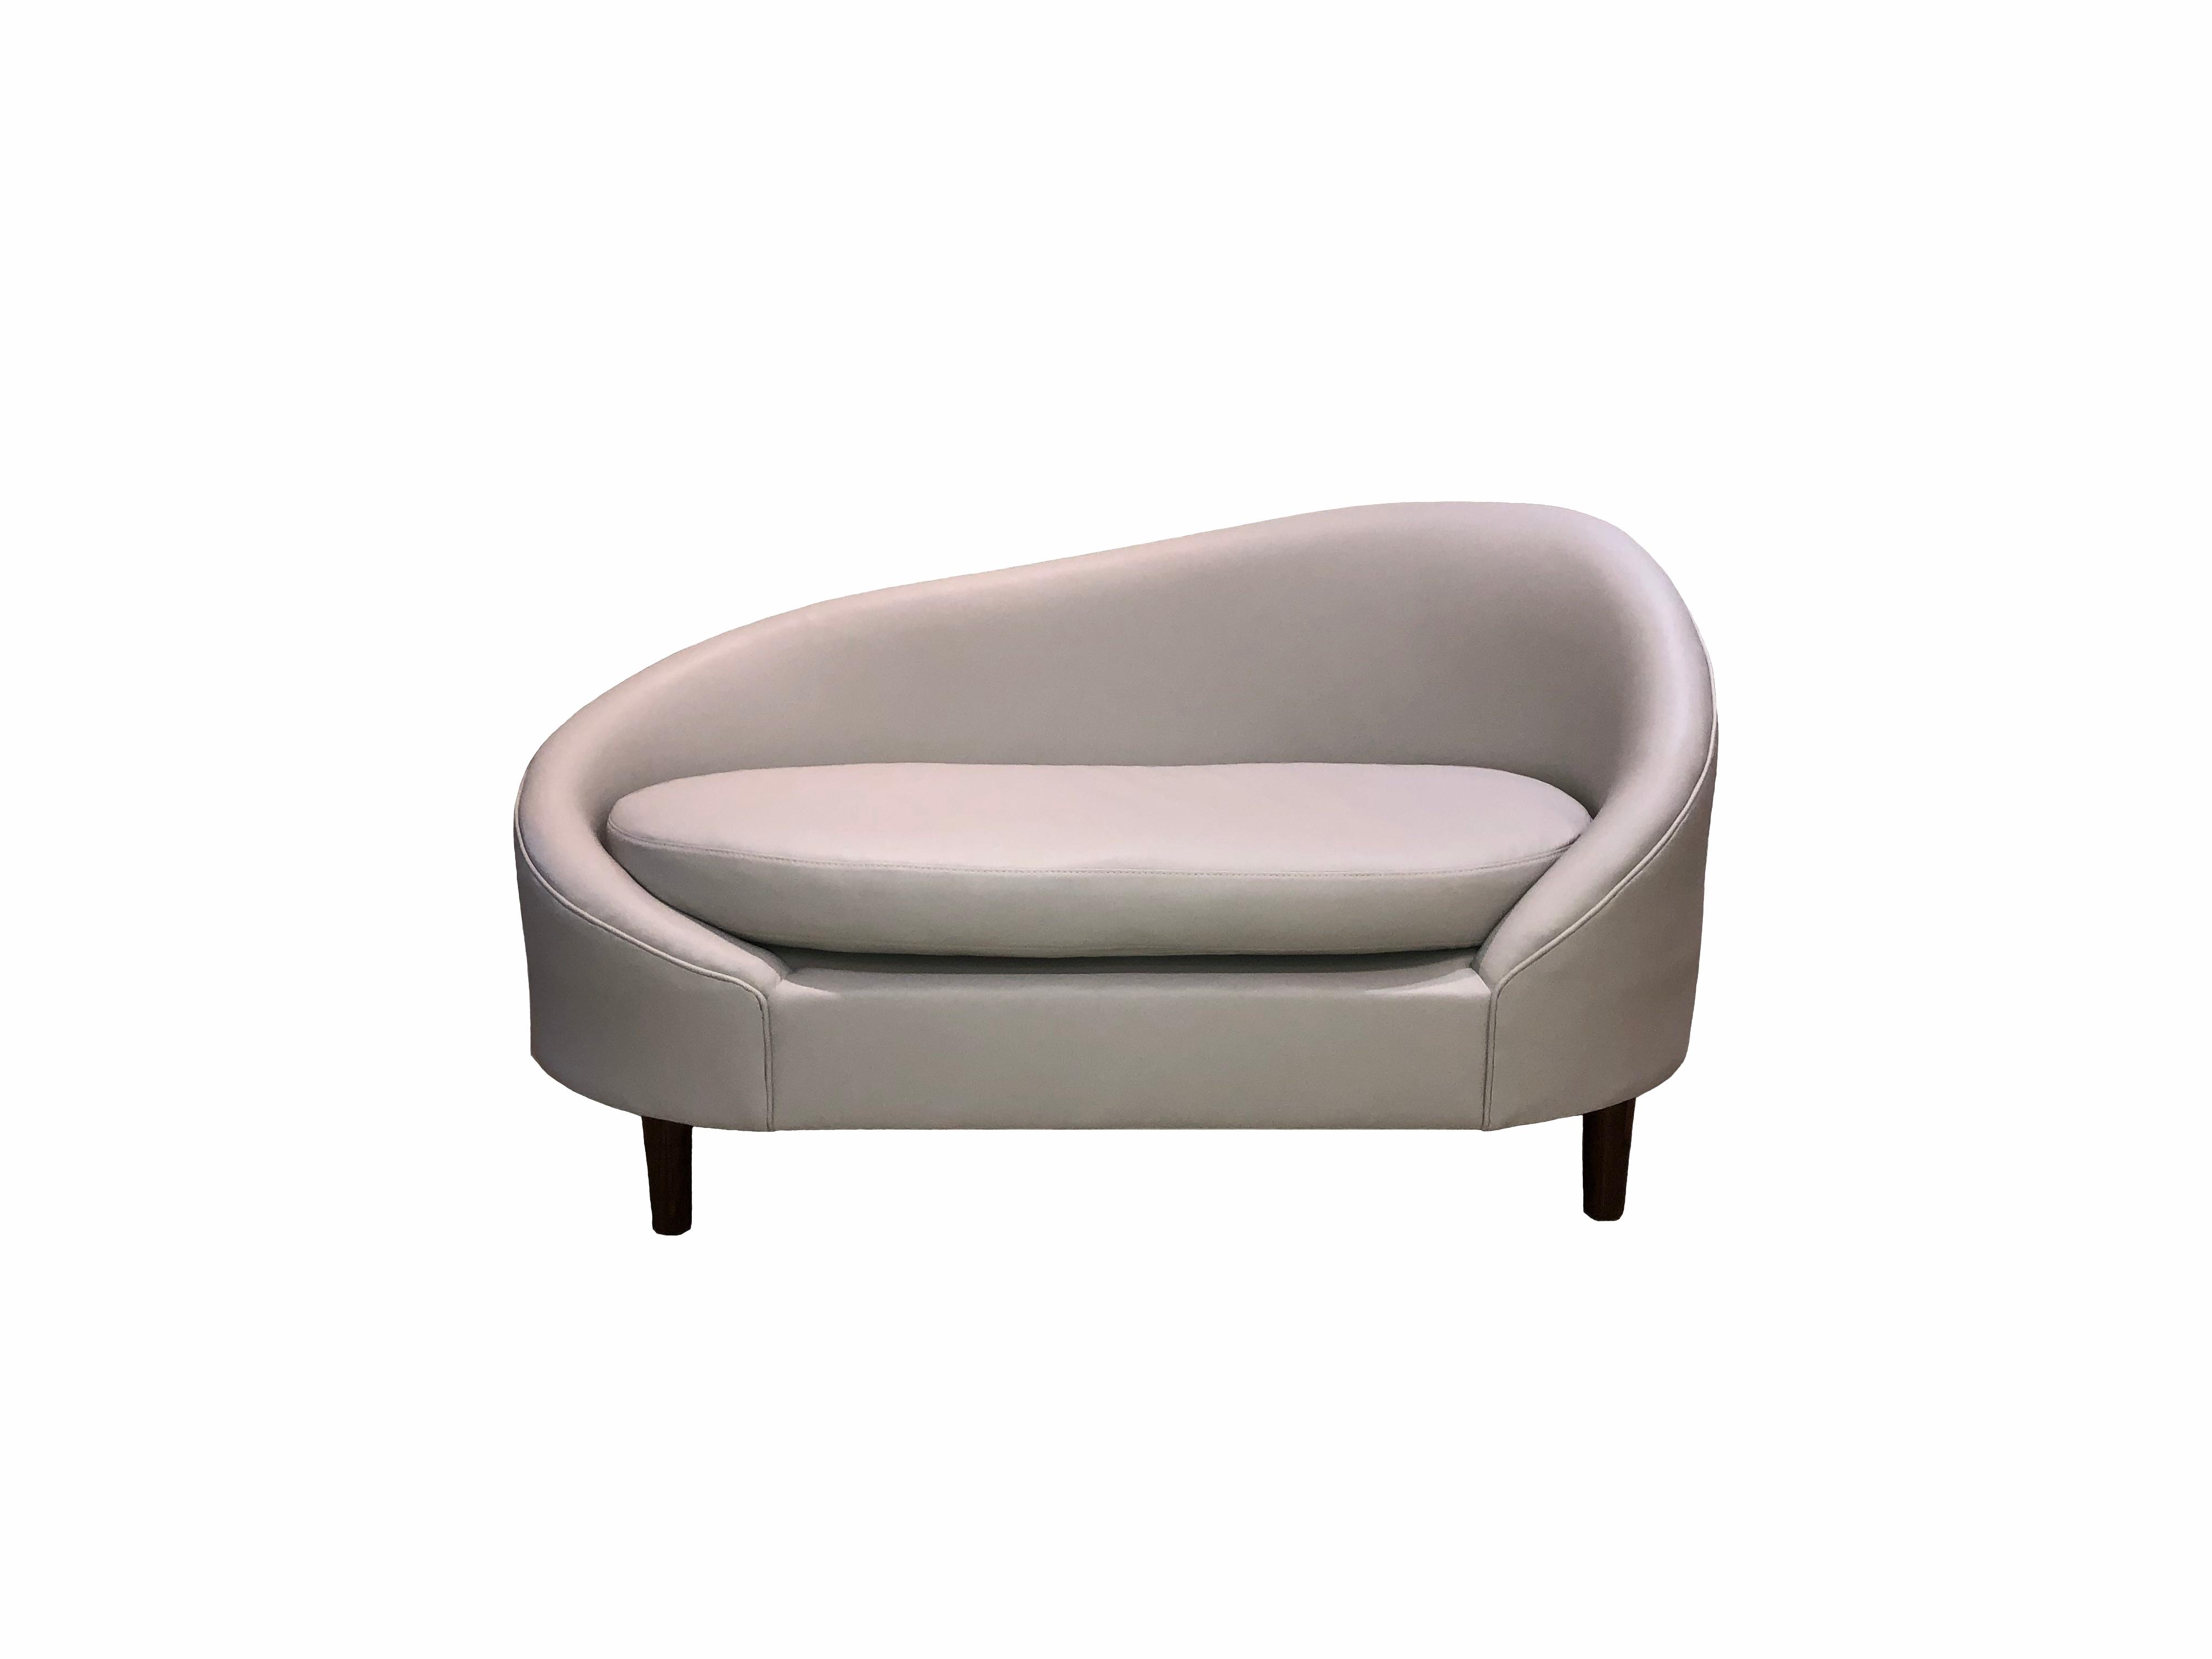 Chloé chaise